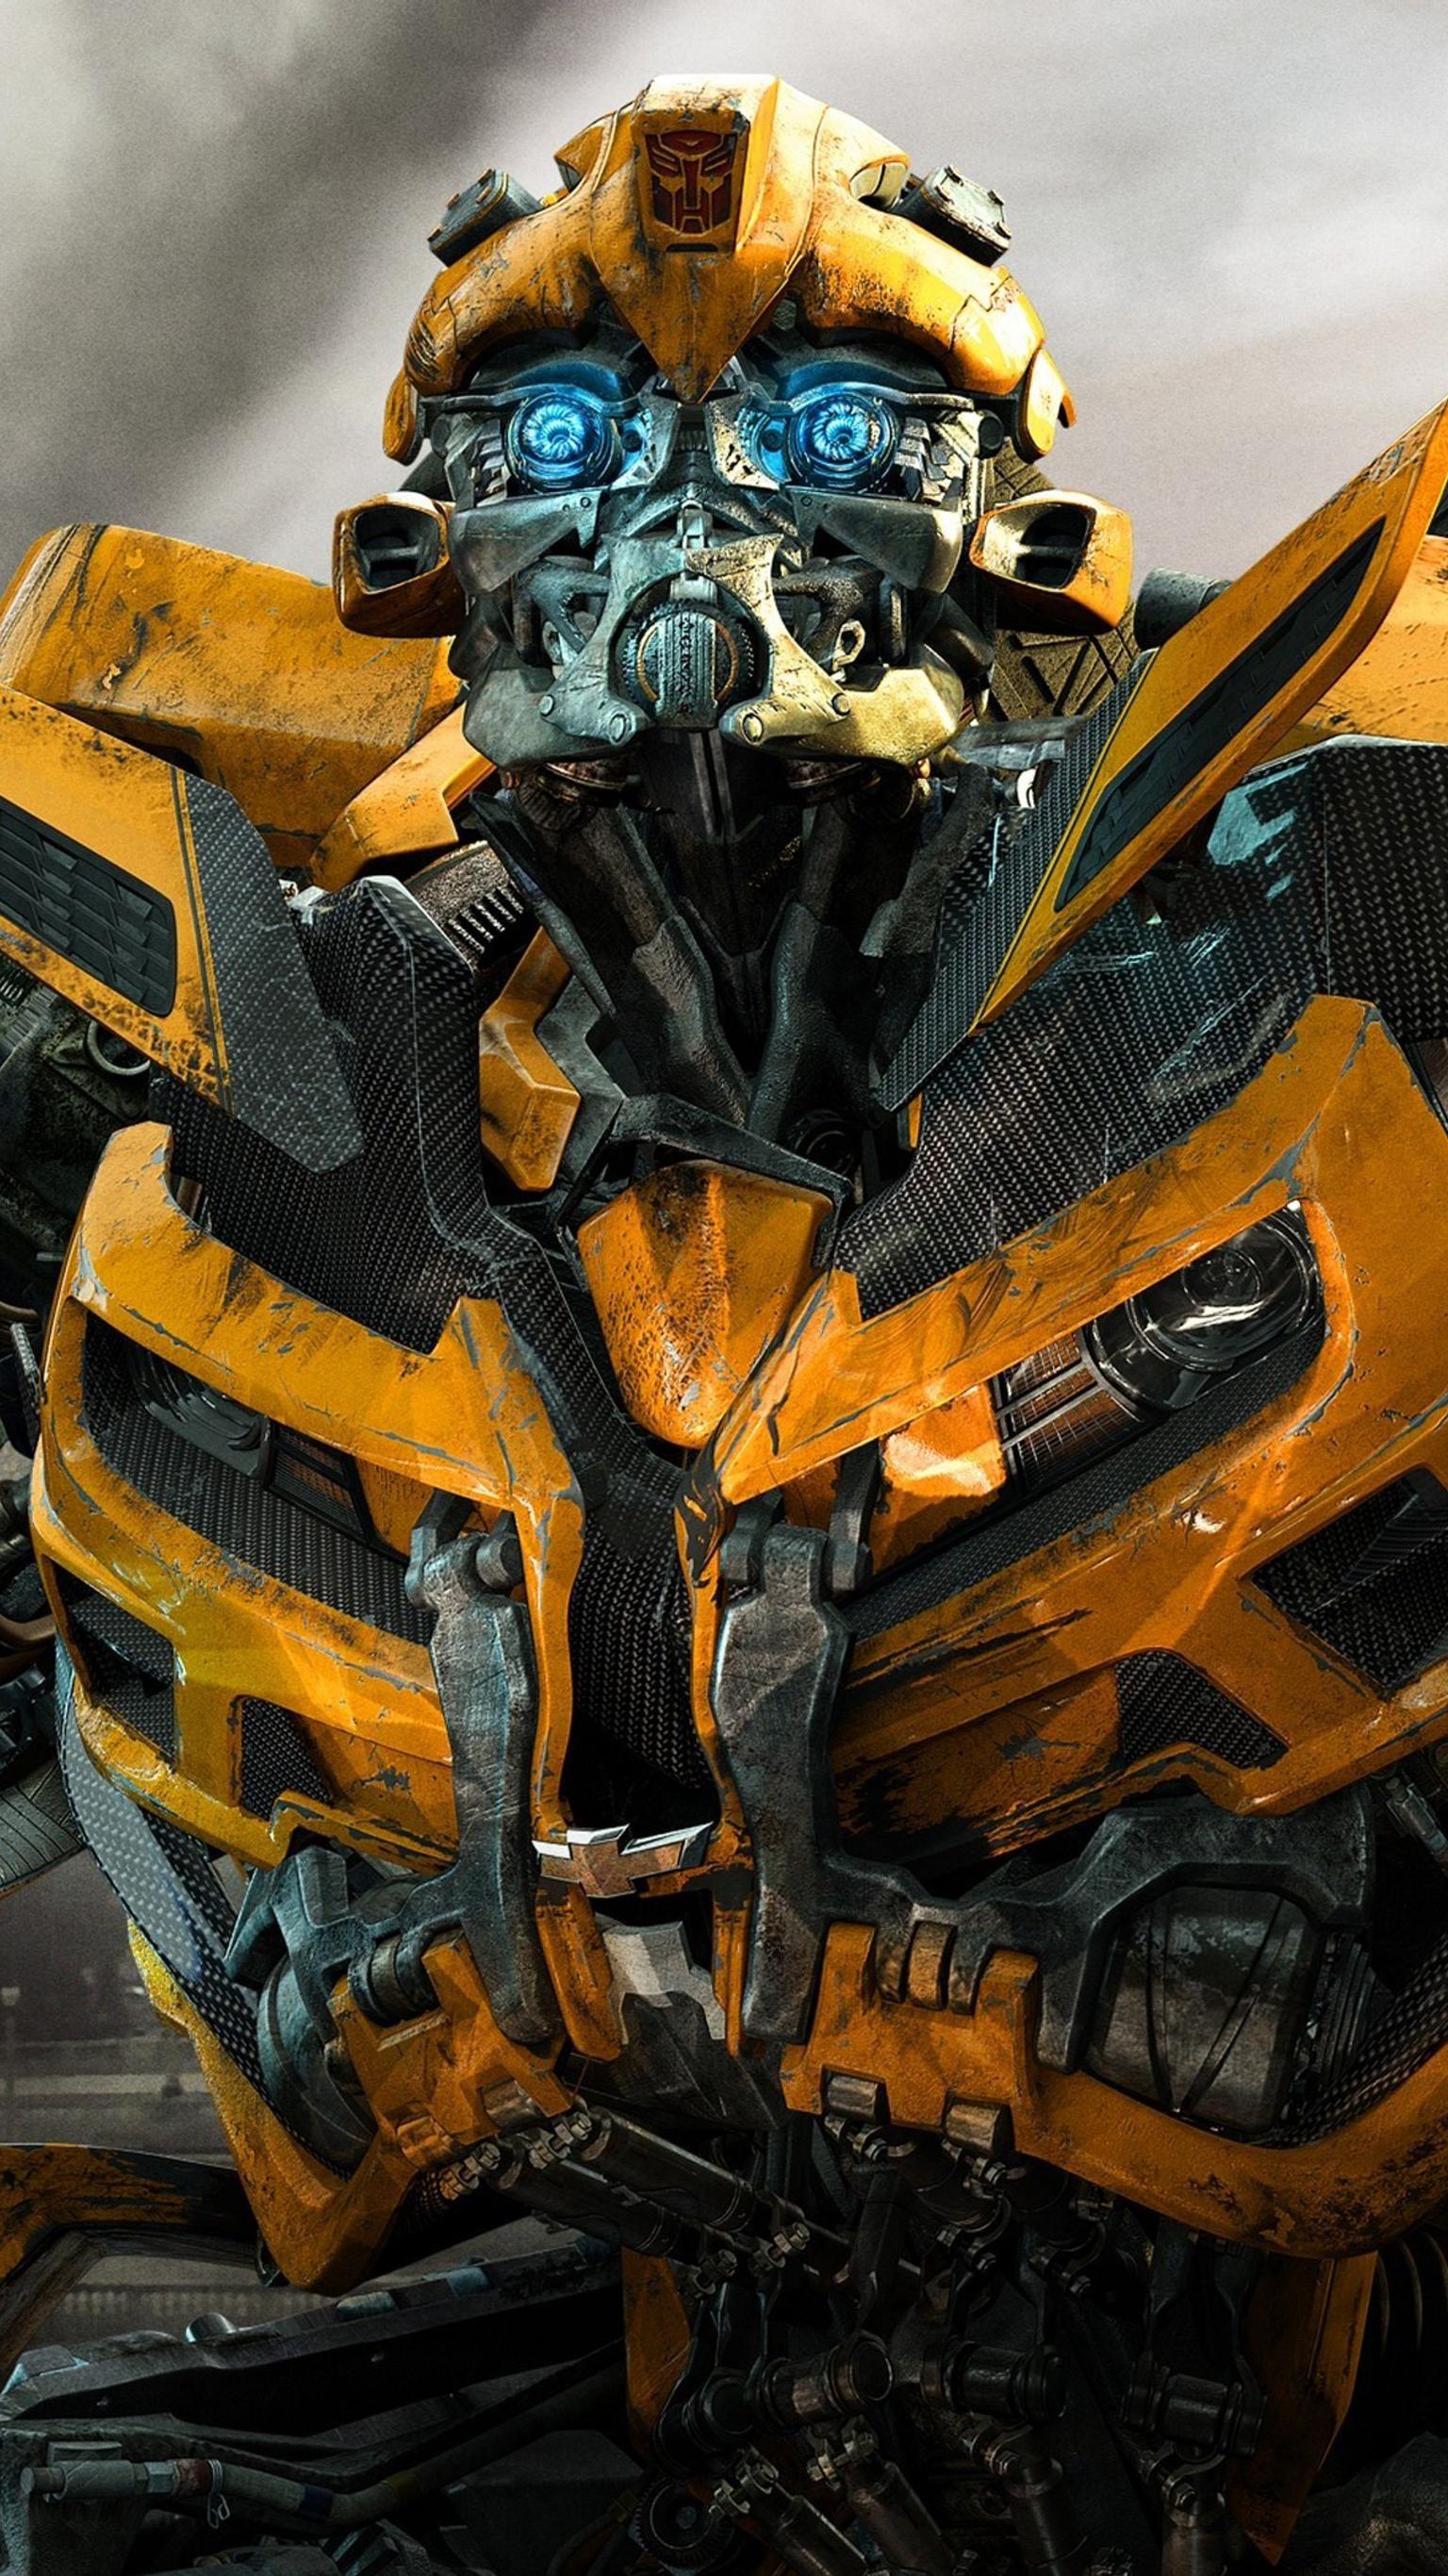 Transformers Dark Of The Moon 2011 Phone Wallpaper Moviemania Transformers Bumblebee Transformers Autobots Transformers